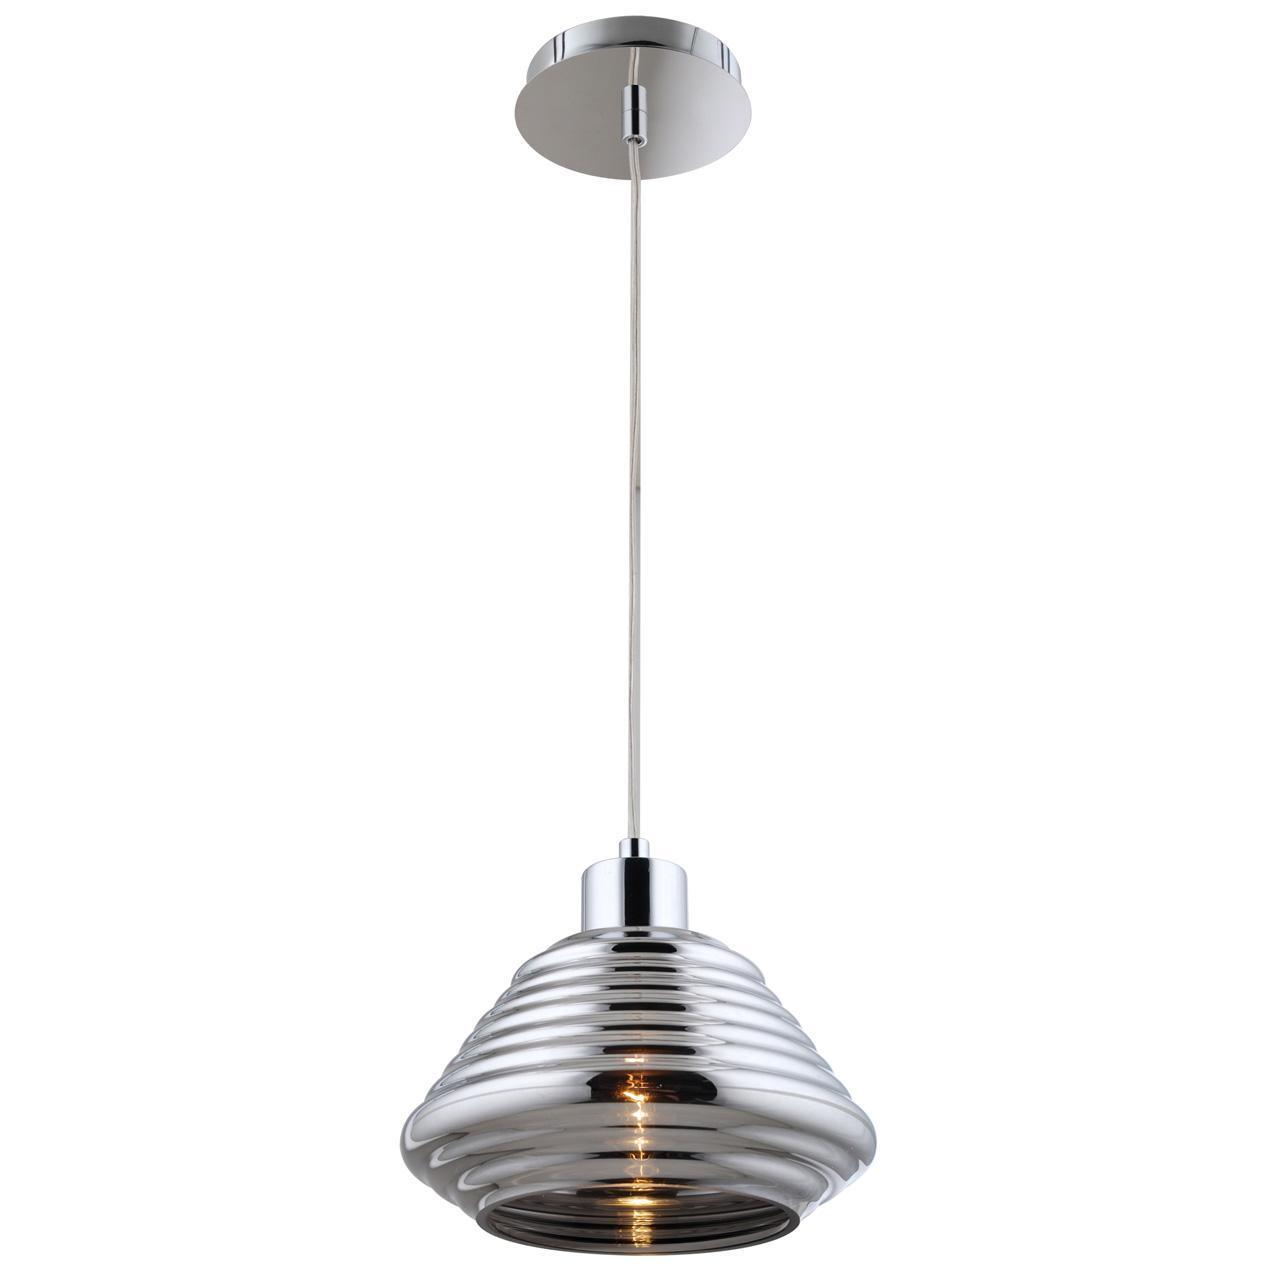 Подвесной светильник Spot Light Bali 1198128 lml 0460 60w 5400lm 6000k 12 cree led white light 7 spot flood work light black 9 80v